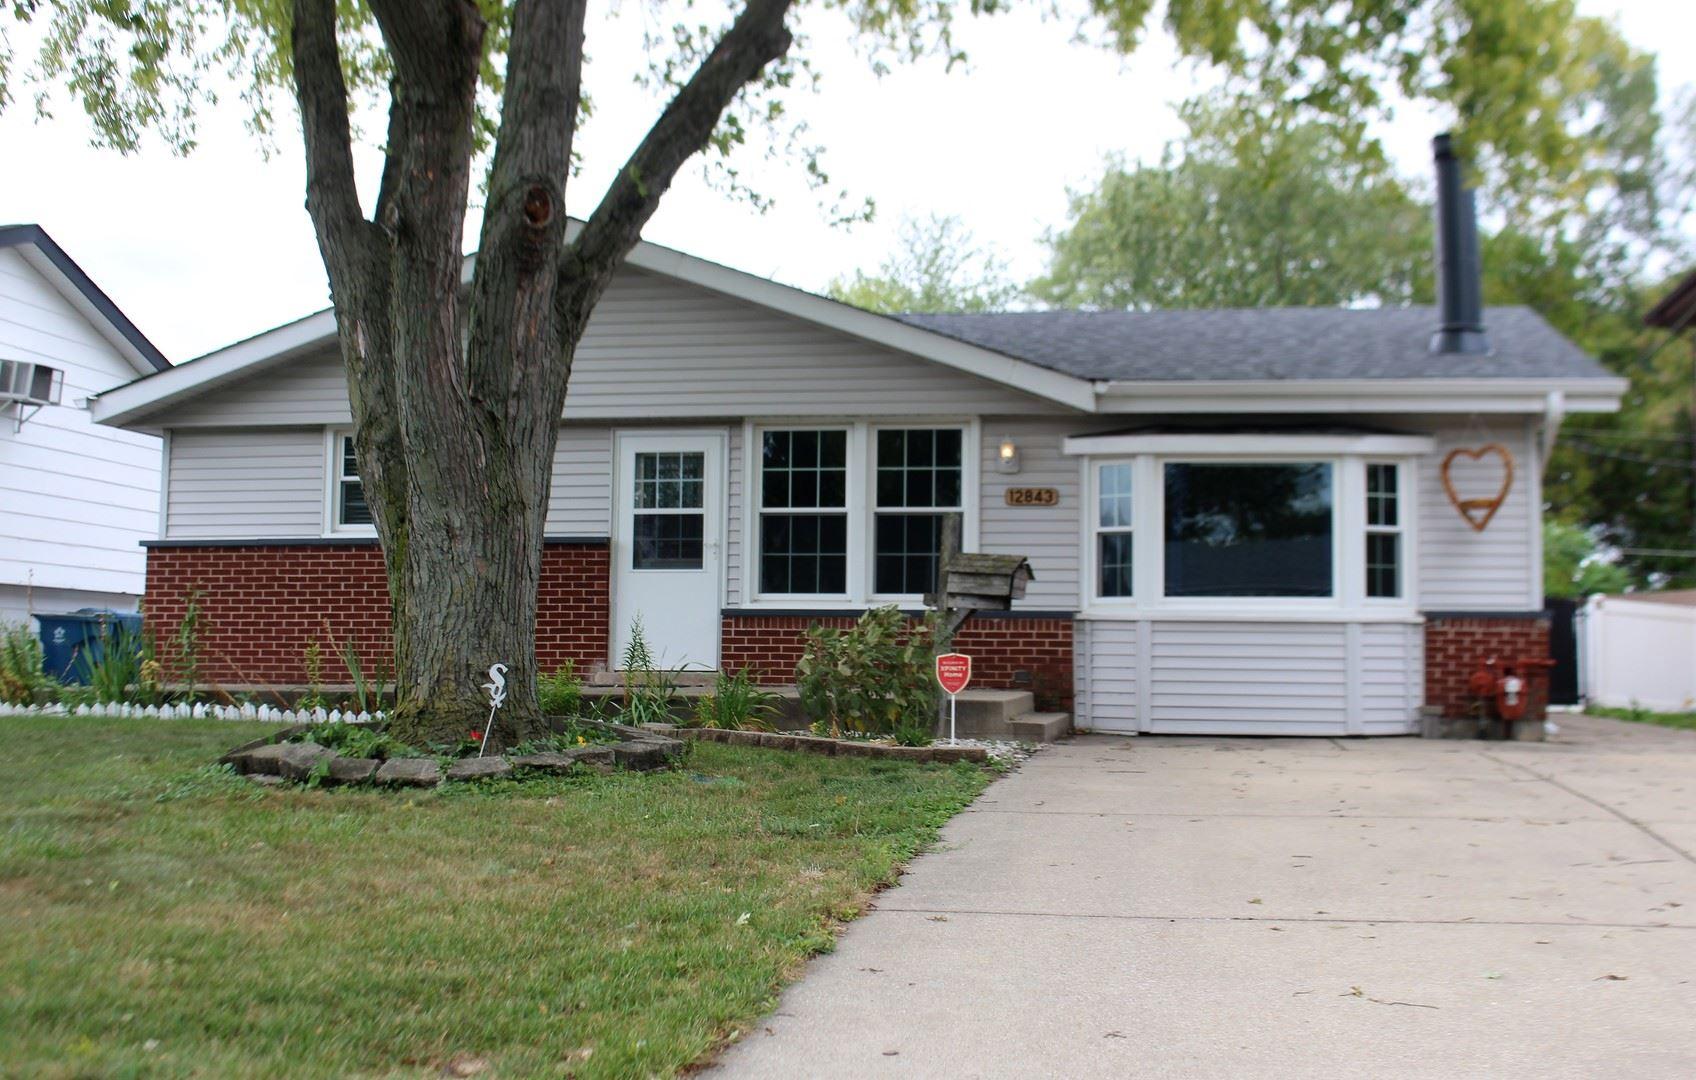 12843 E Playfield Drive, Crestwood, IL 60418 - #: 11226832